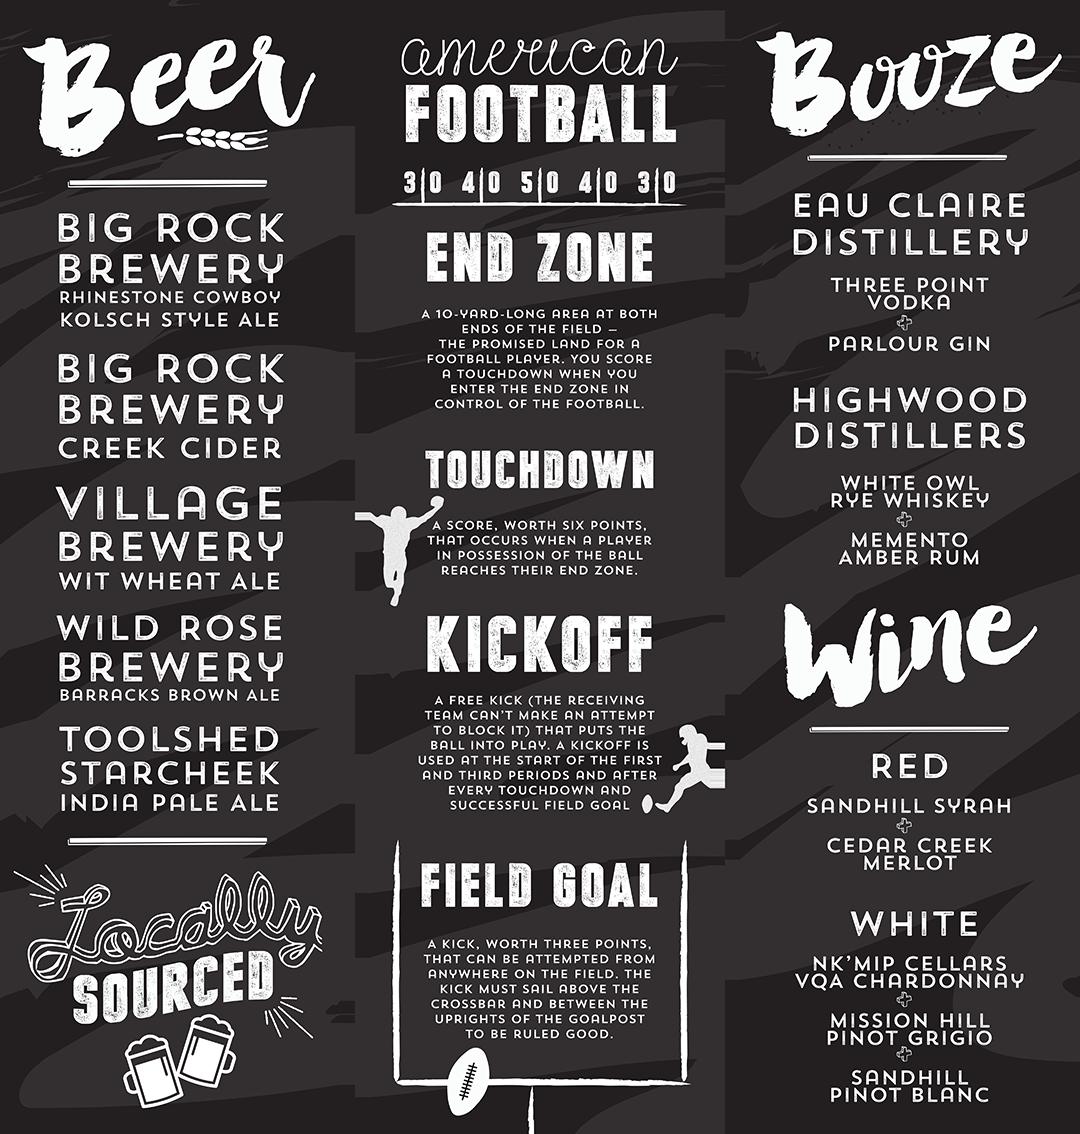 Booze_Beer_Football_Sign_Poster_Banner_Graphic_Designer_Cochrane.png